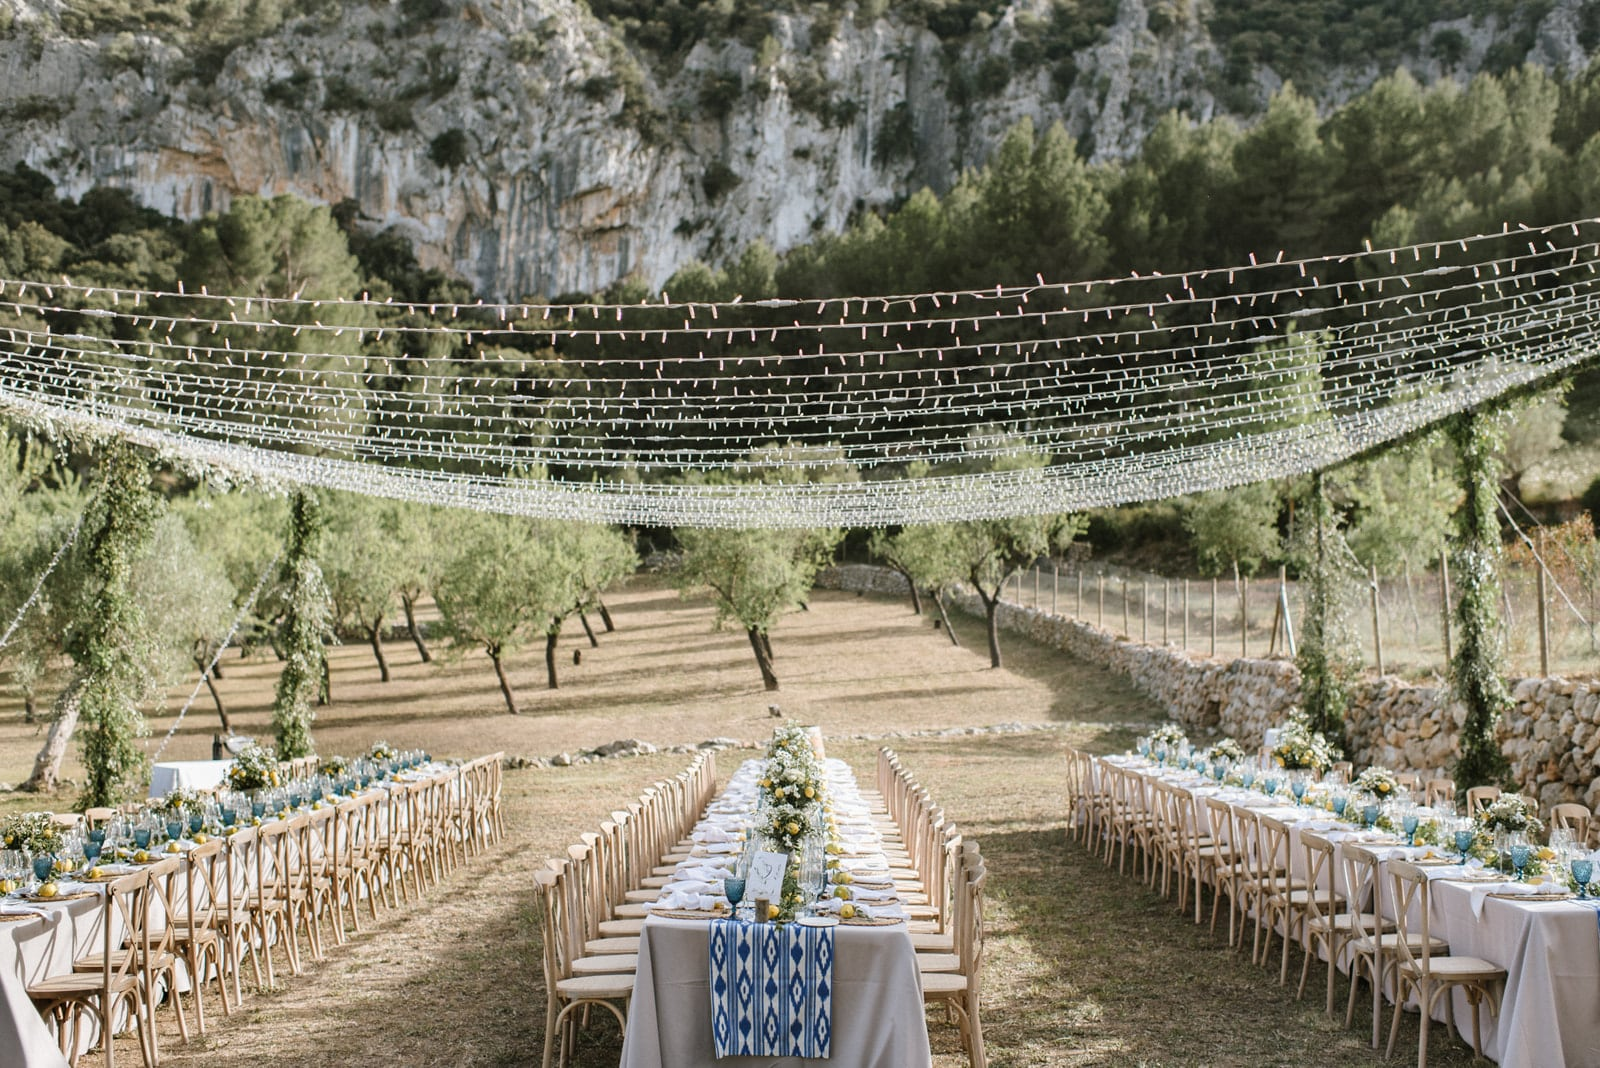 banquete en la Tramuntana de Mallorca con techo de fairy lights estilo mallorquín